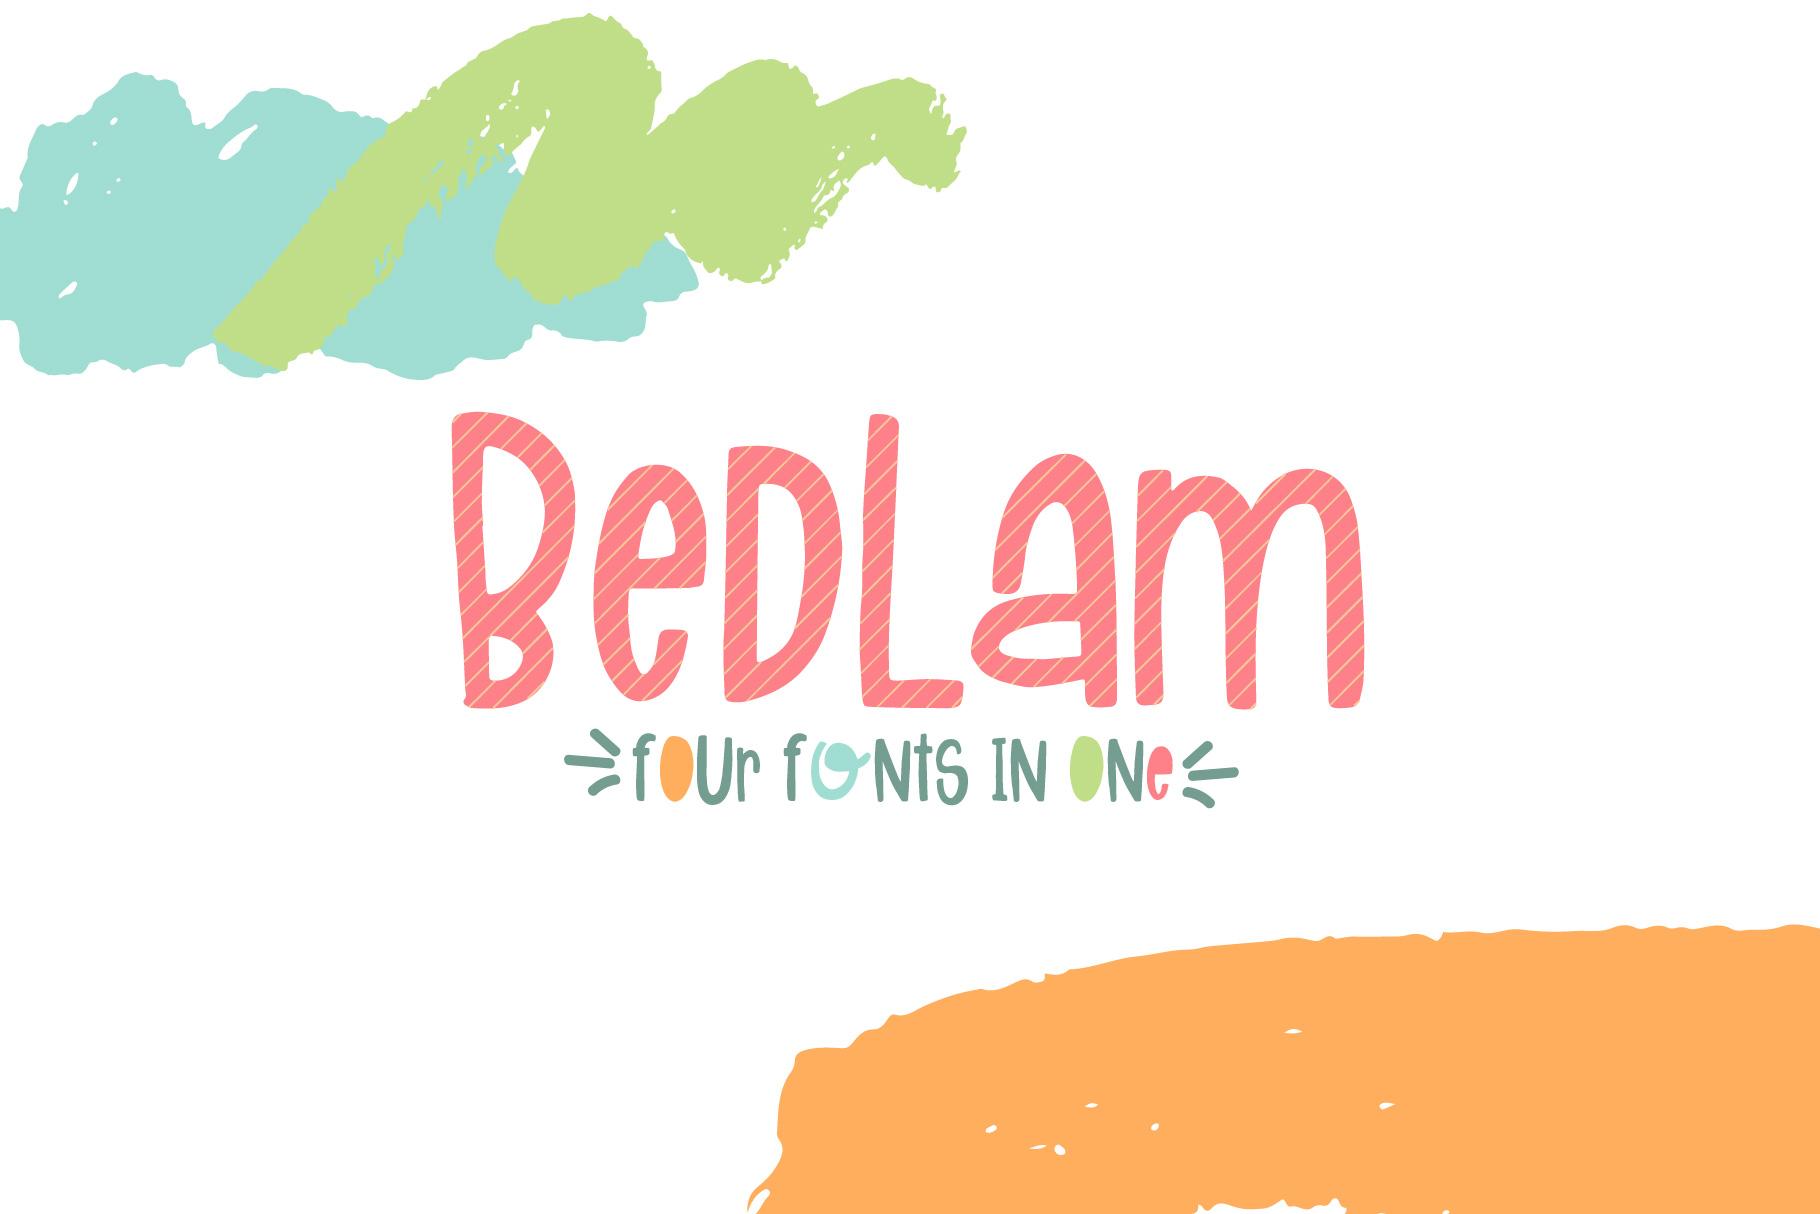 Bedlam example image 1